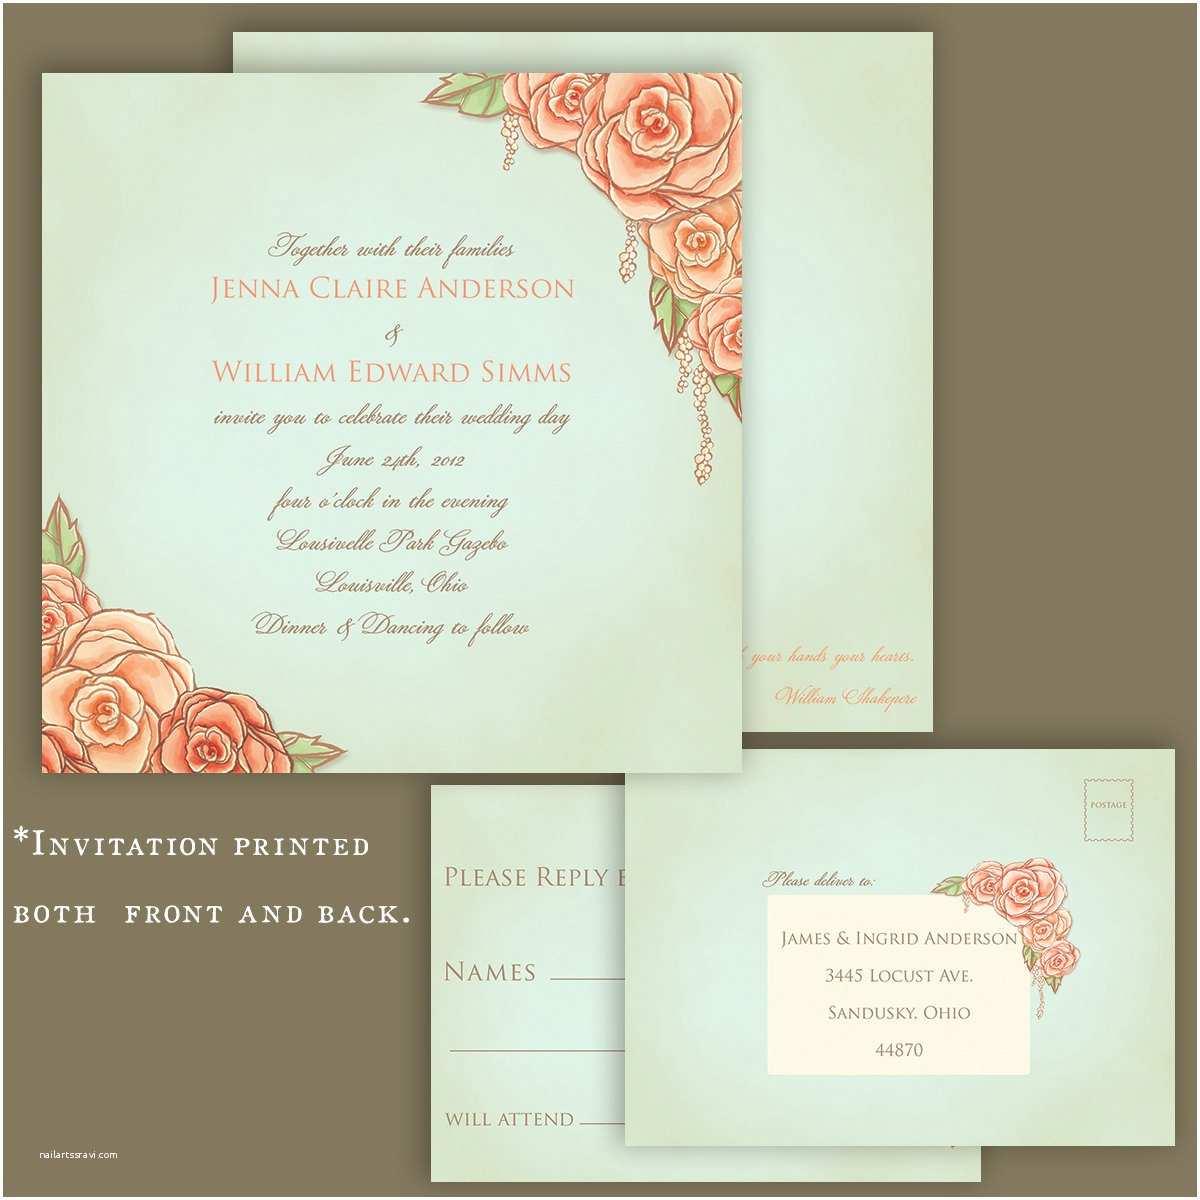 Vintage Rose Wedding Invitations Vintage Rose Garden Wedding Invitation Hand by Felicedesign